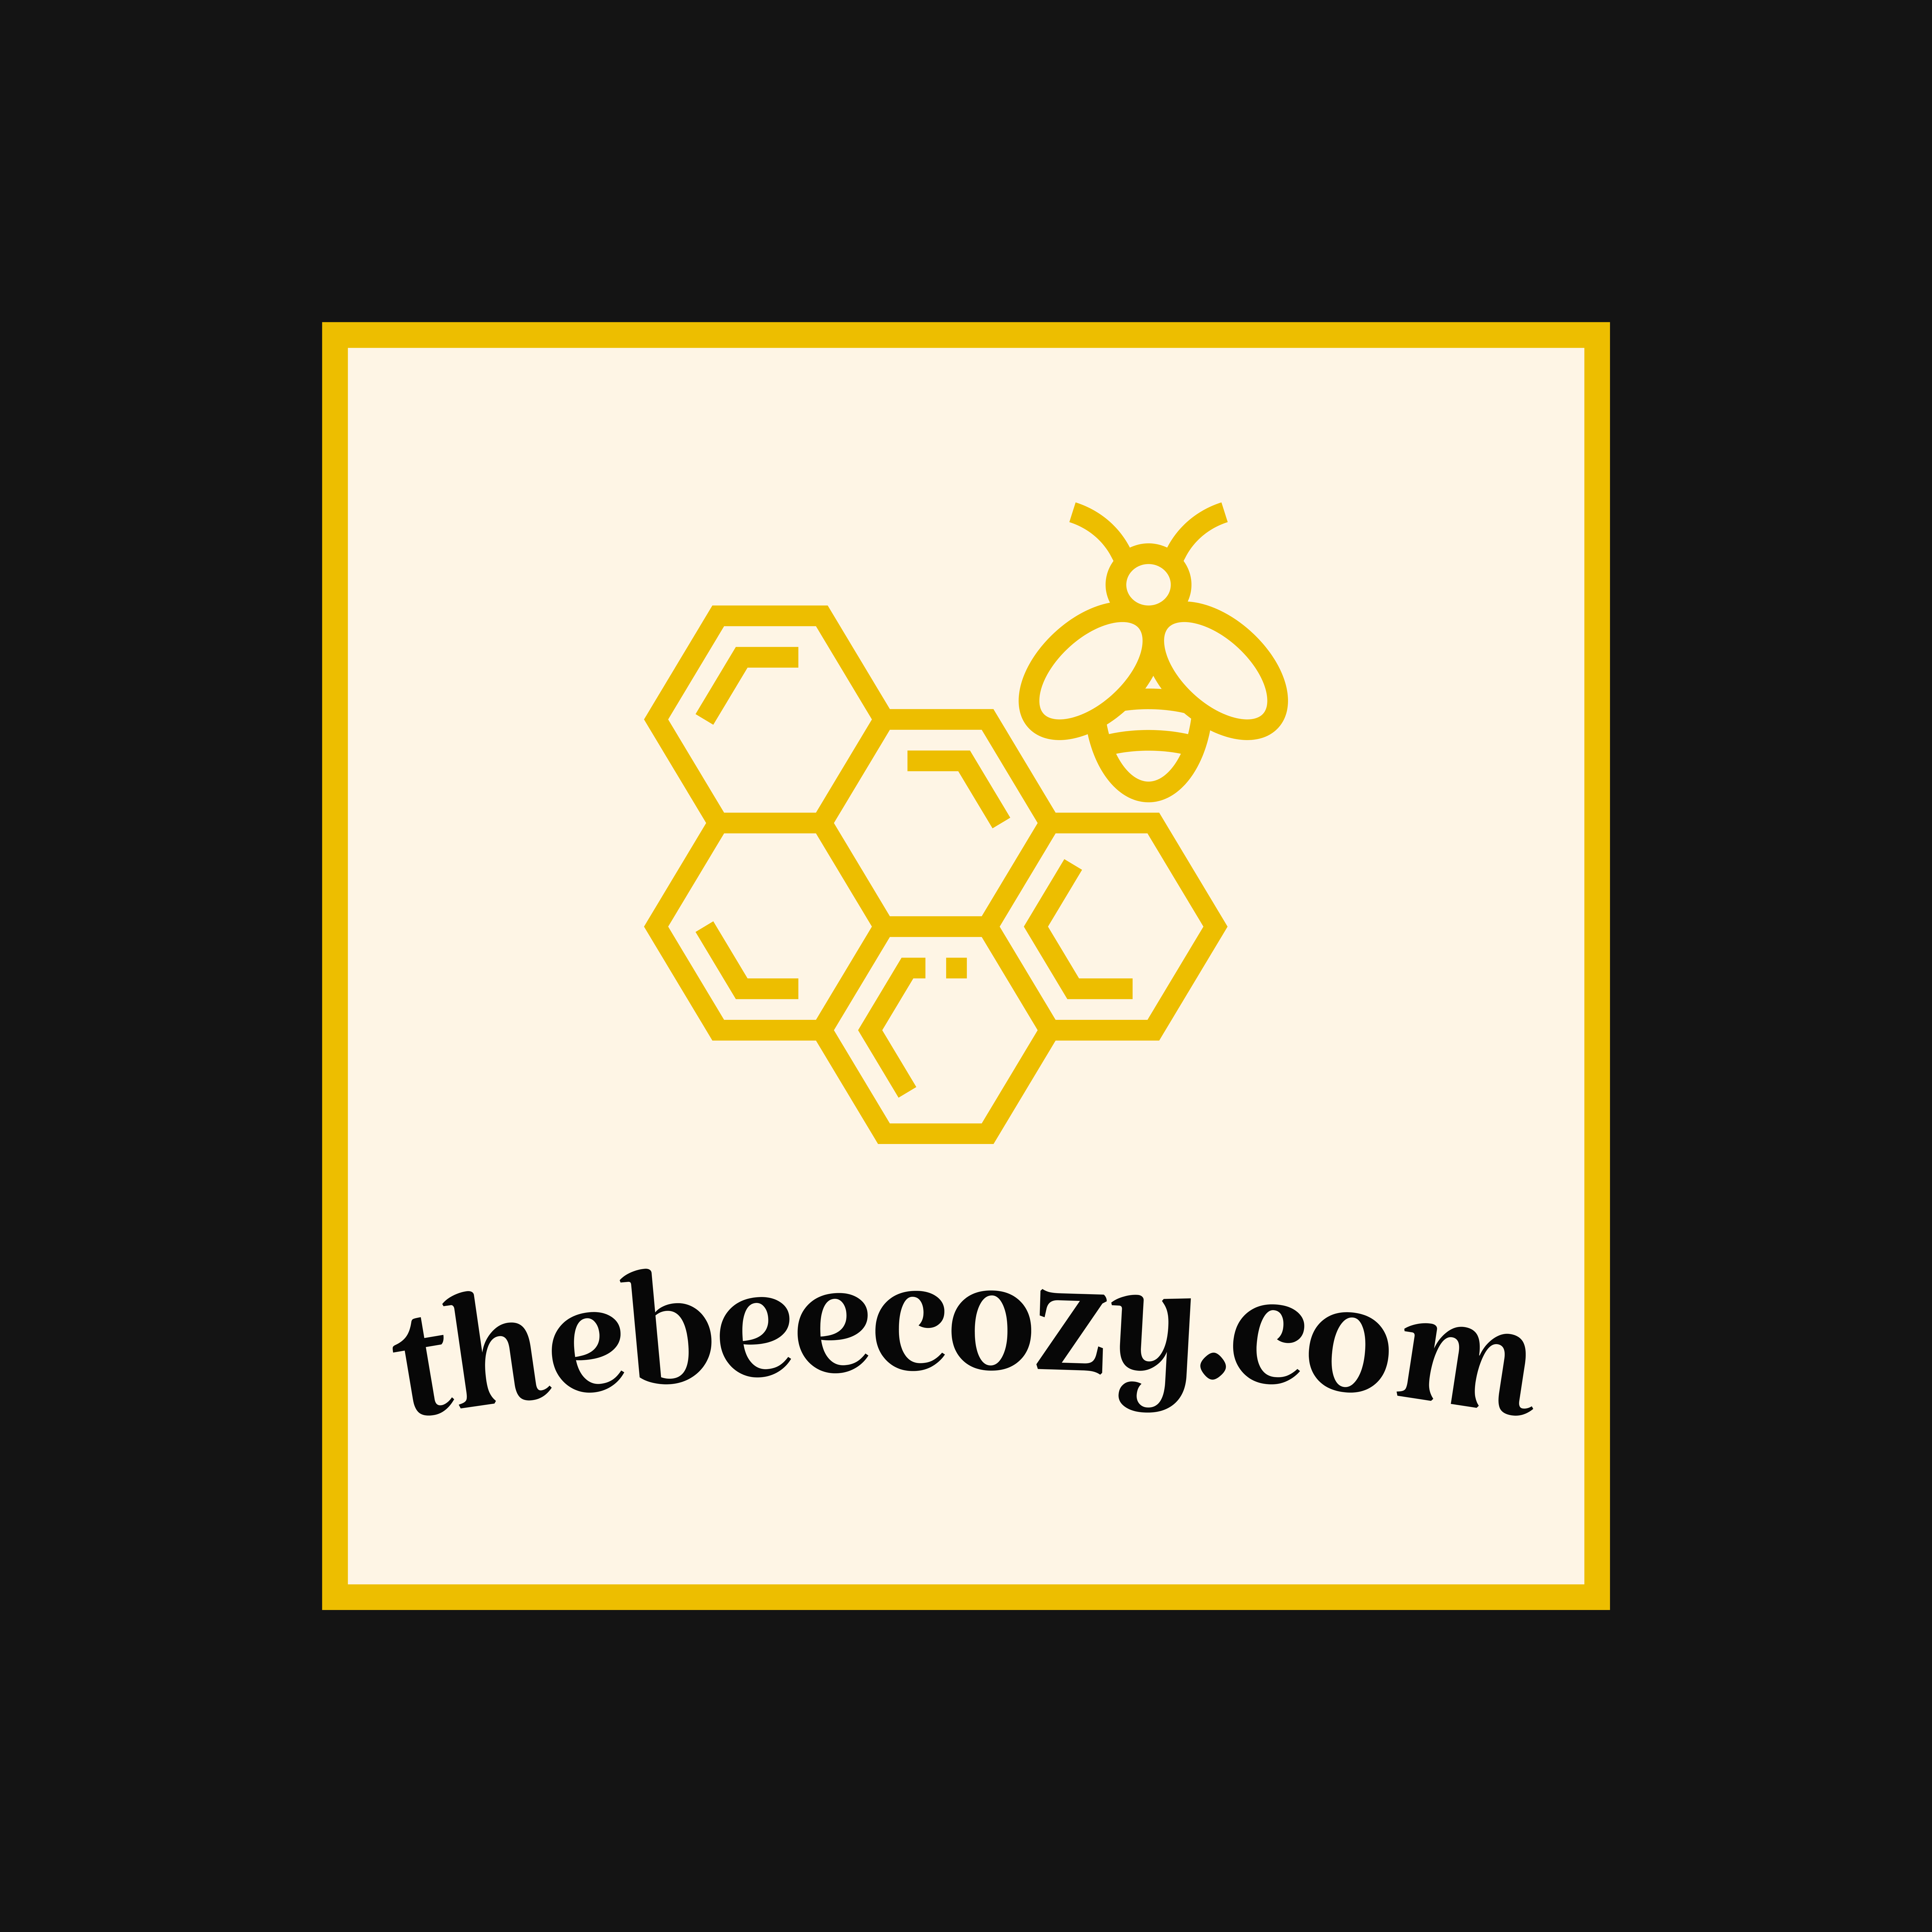 www.thebeecozy.com